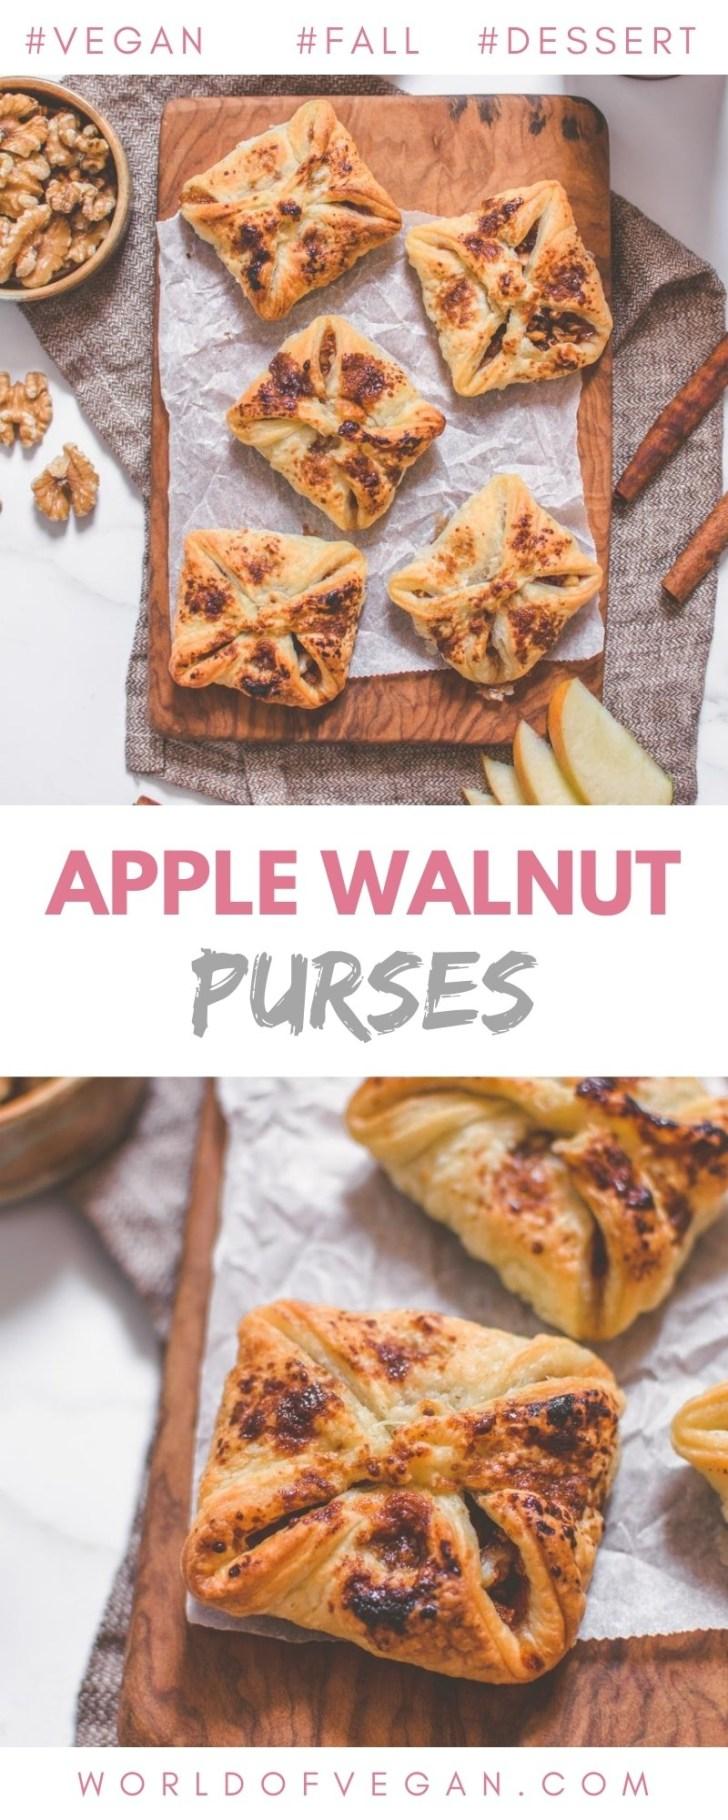 Vegan Apple Walnut Purses Pin